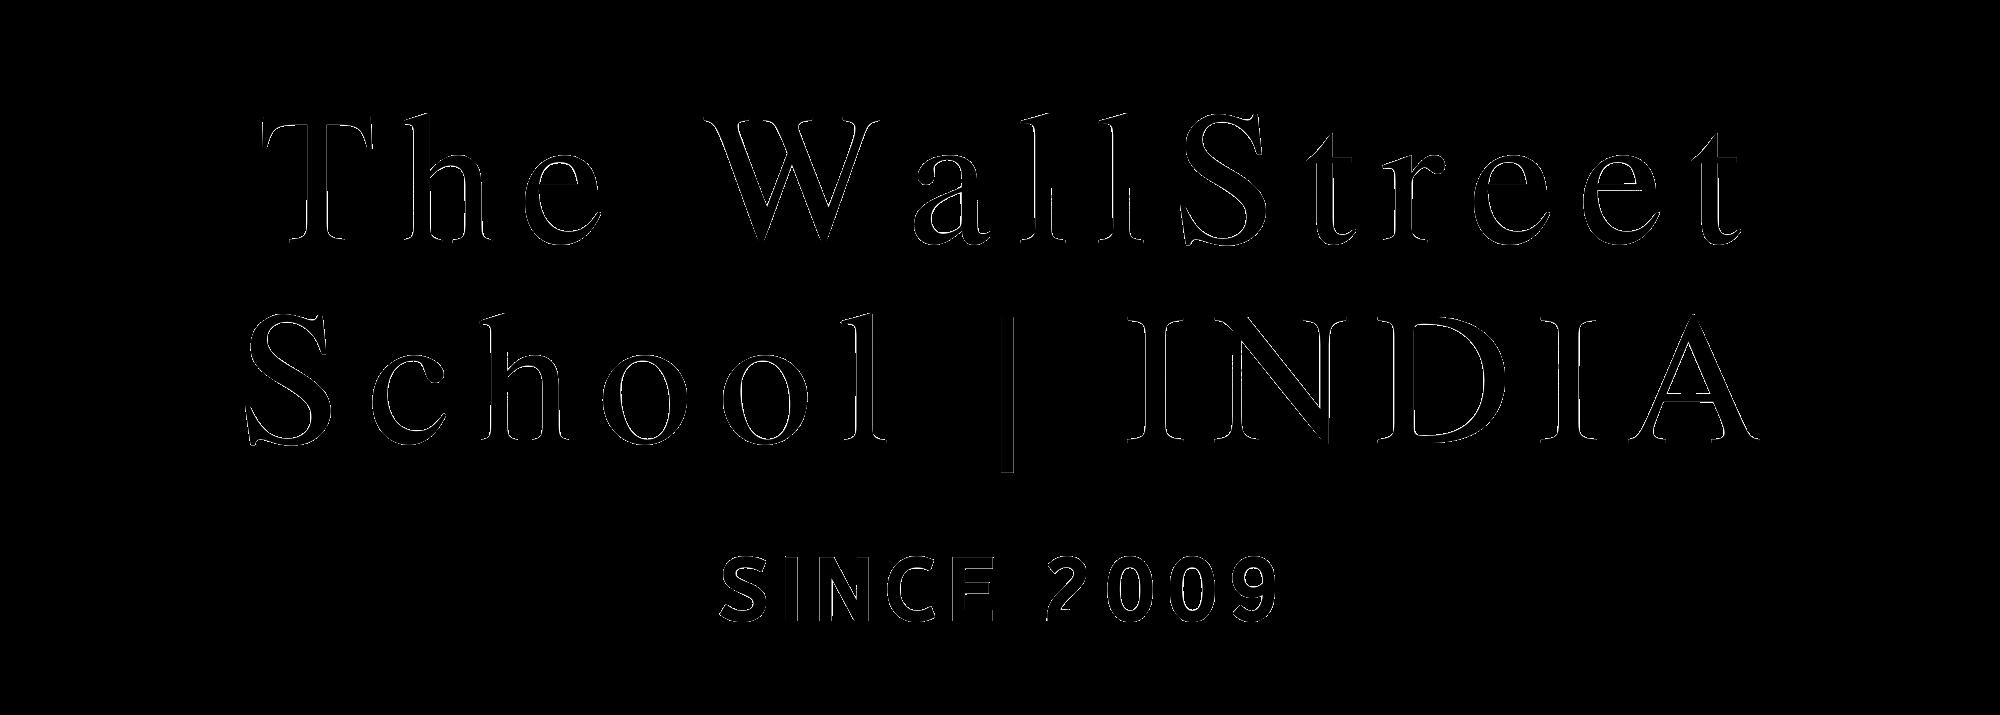 Twss Logo